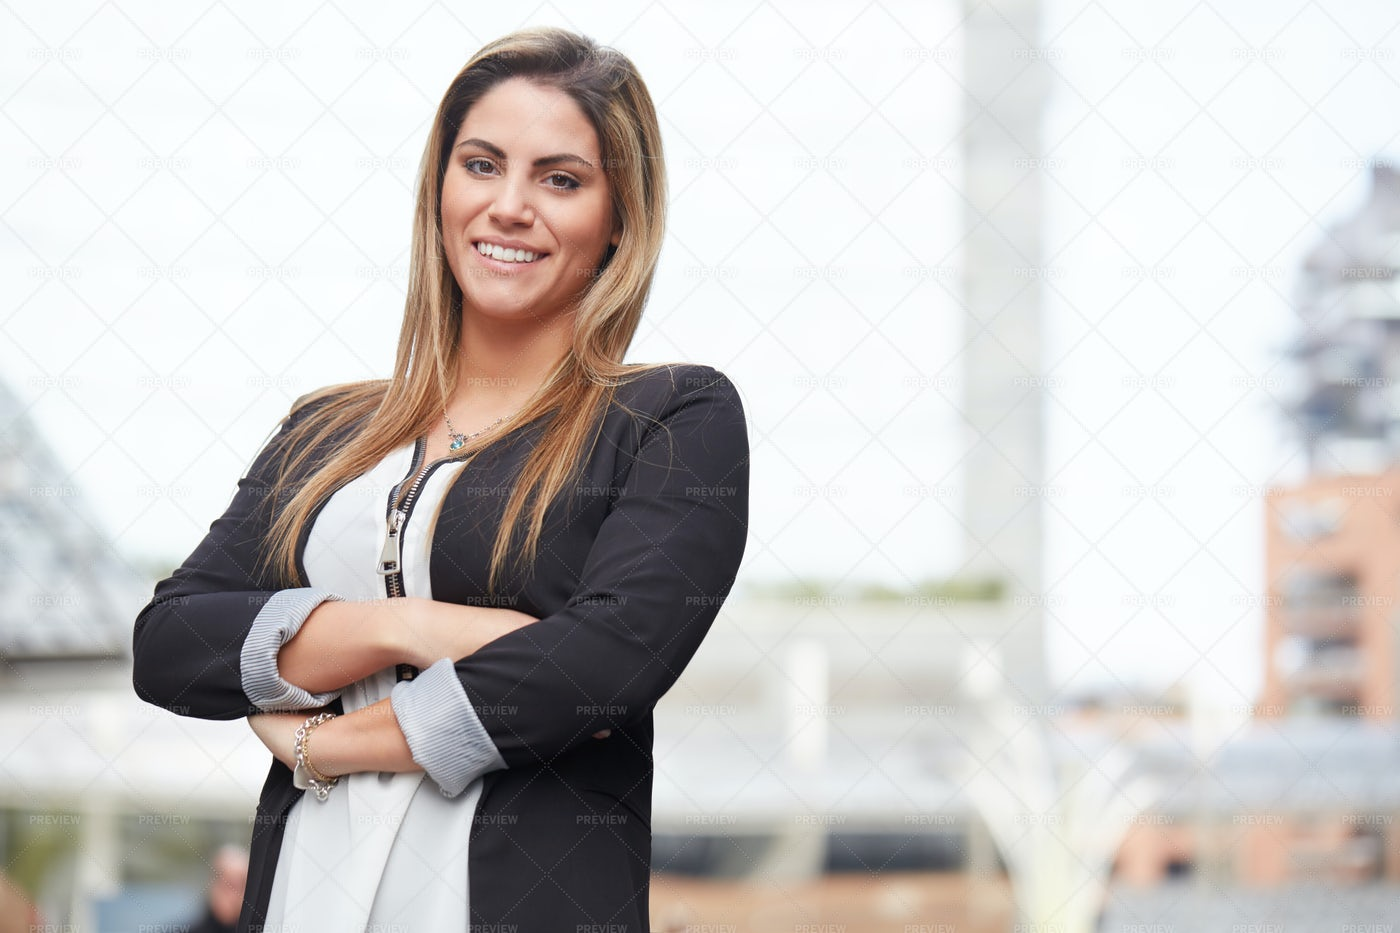 Businesswoman In Urban Environment: Stock Photos